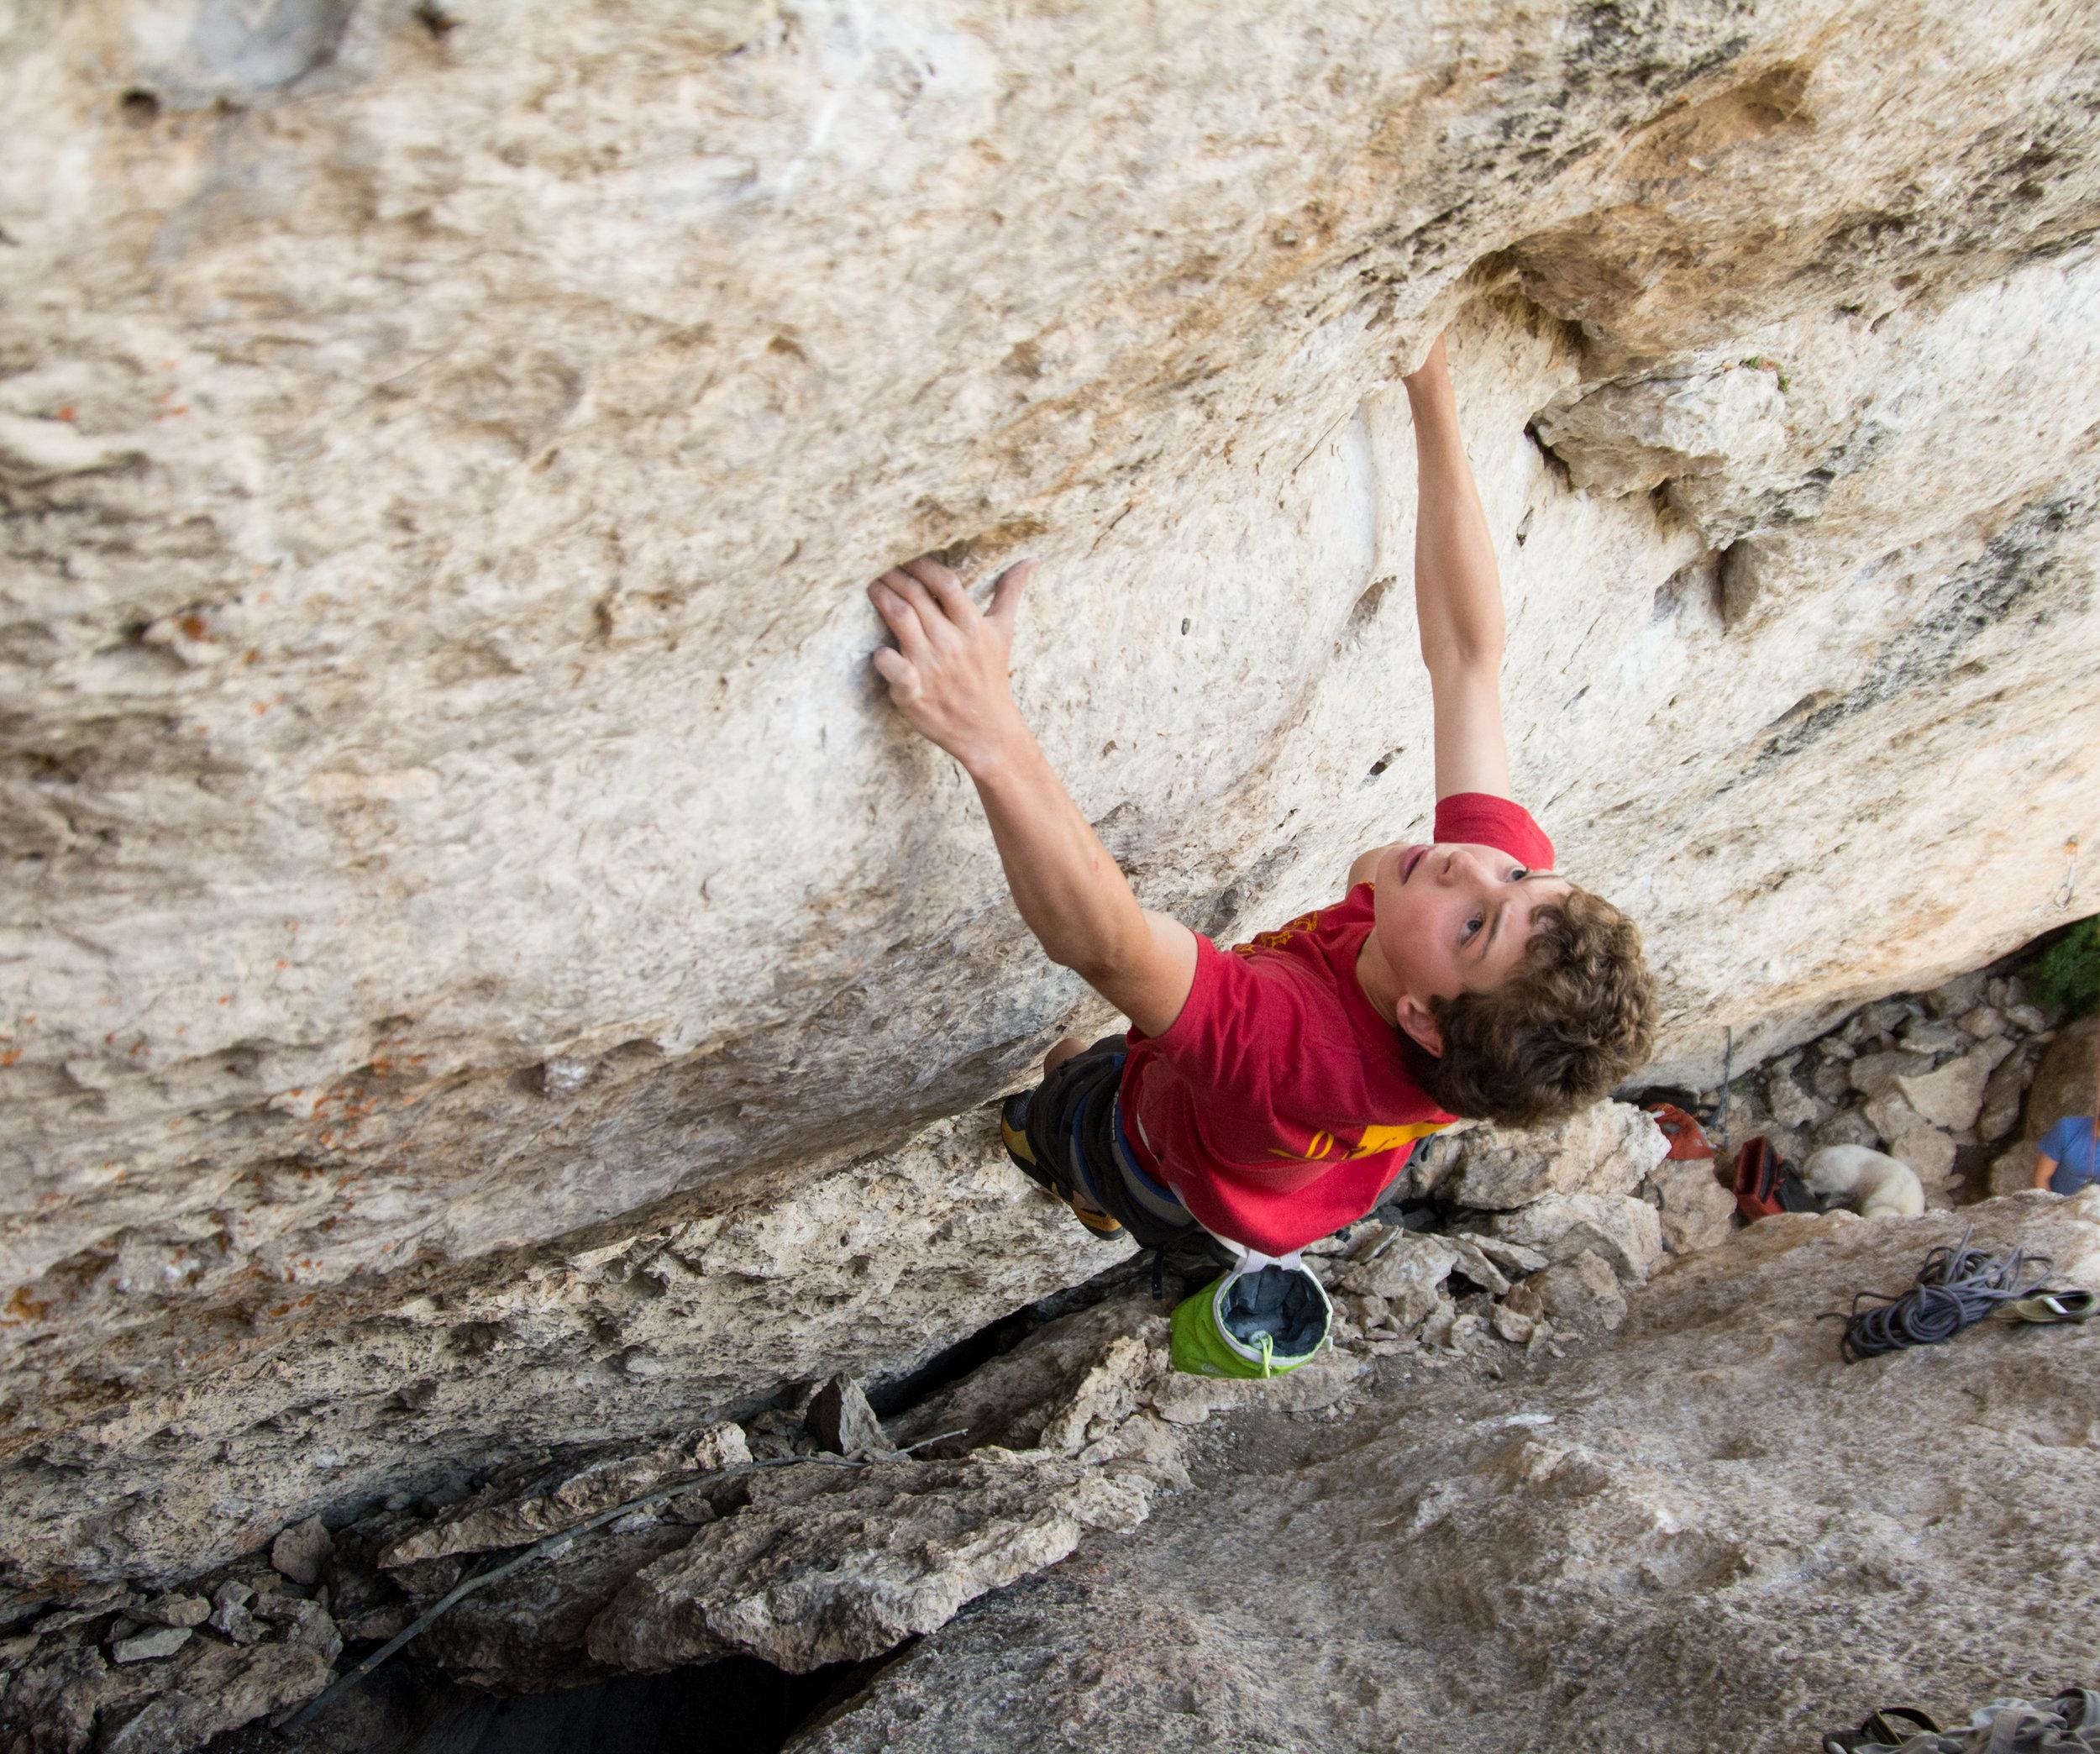 Jonathan Horst climbing at the Rodeo Wave